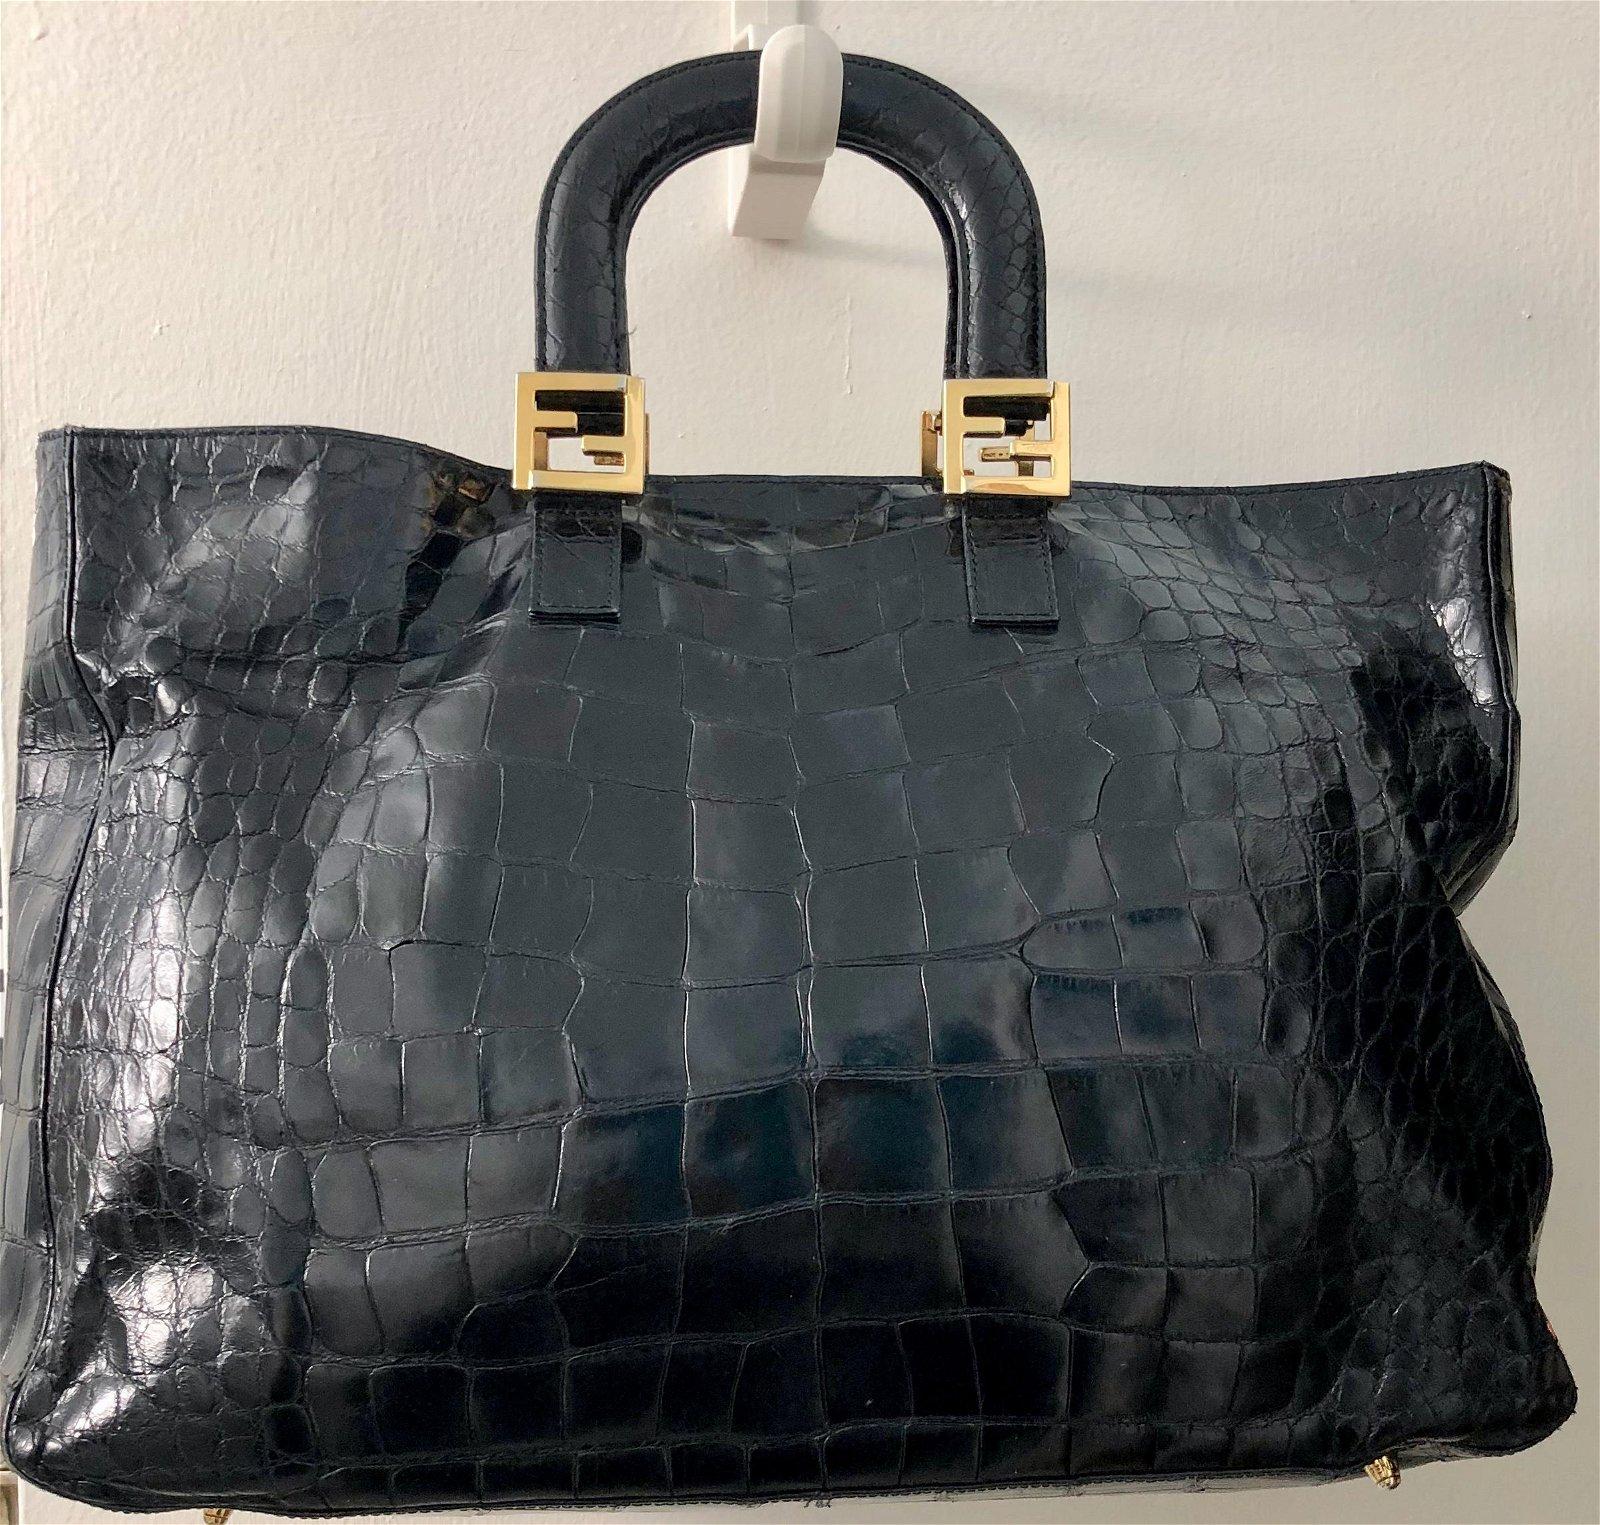 FENDI Crocodile Tote Bag w/ Gold Logo Hardware